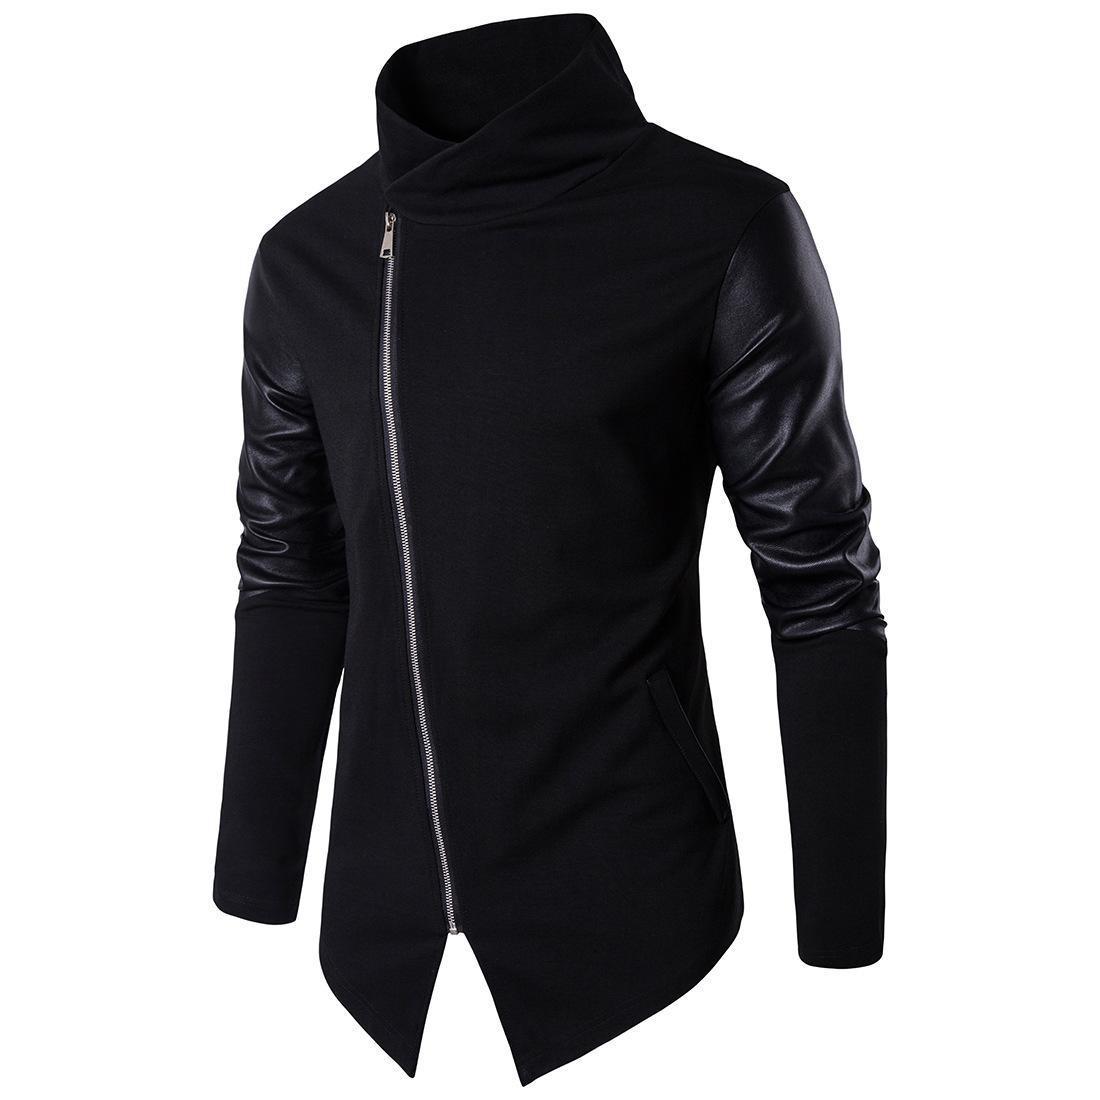 yeni stand yaka Hoody triko patchwork deri örme kapüşonlu ücretsiz gönderim saf pamuklu eşofman siyah renk